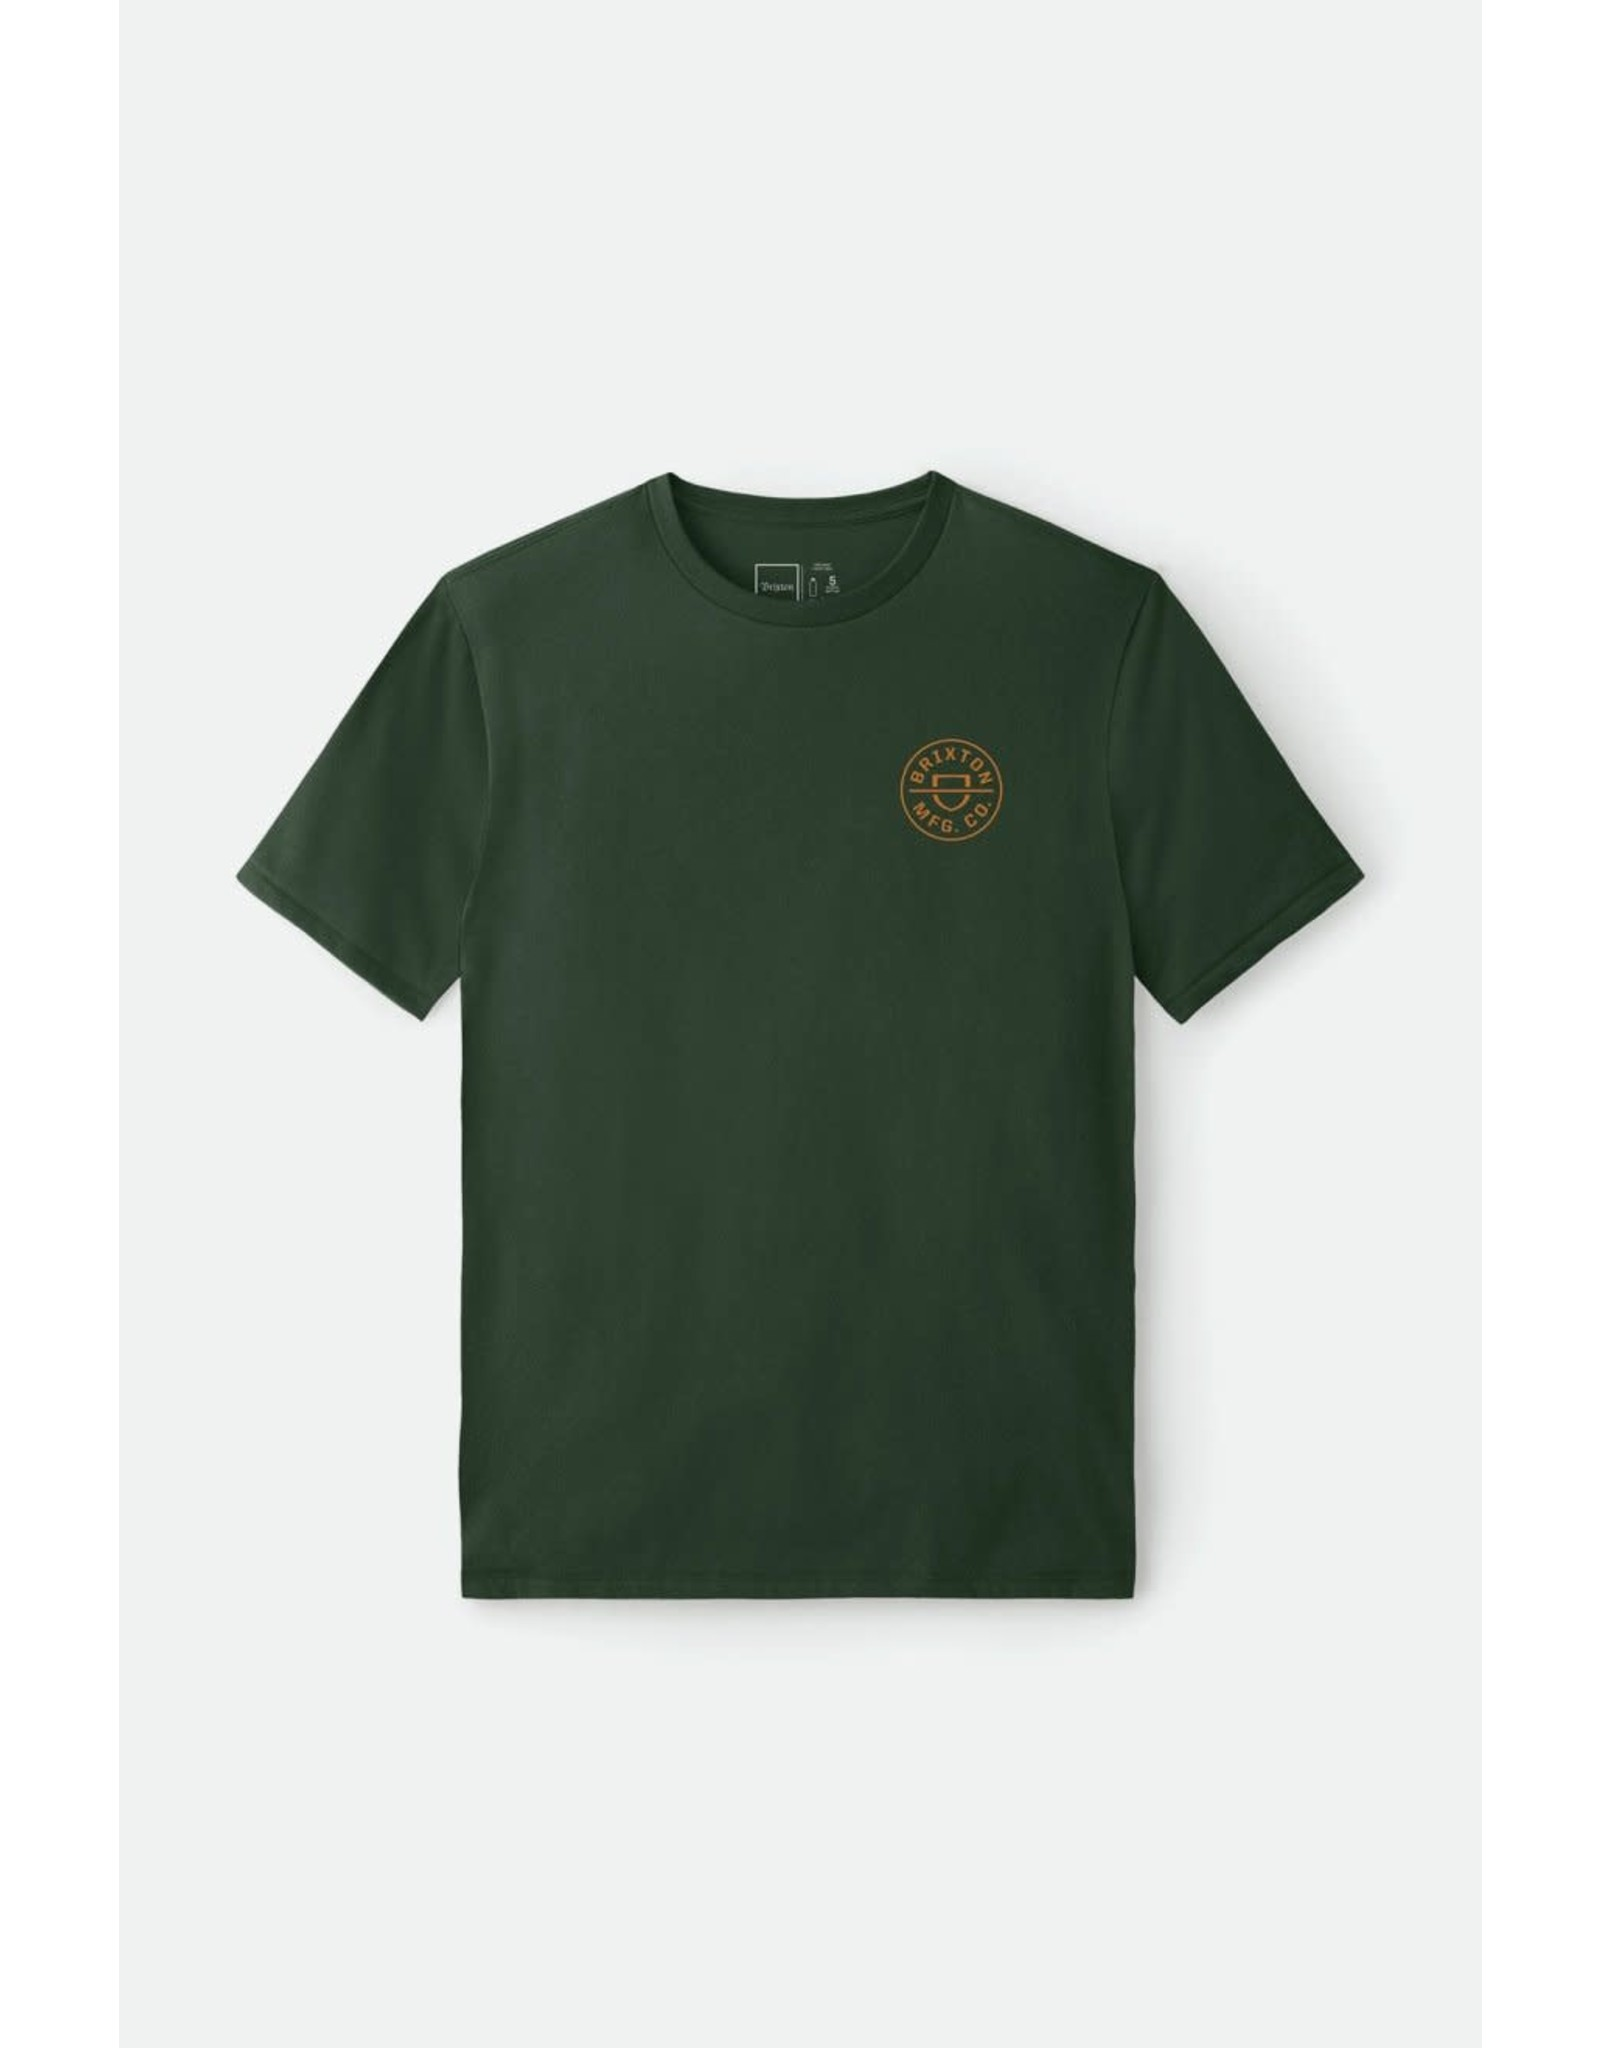 Brixton Brixton - T-shirt homme crest crossover hunter green